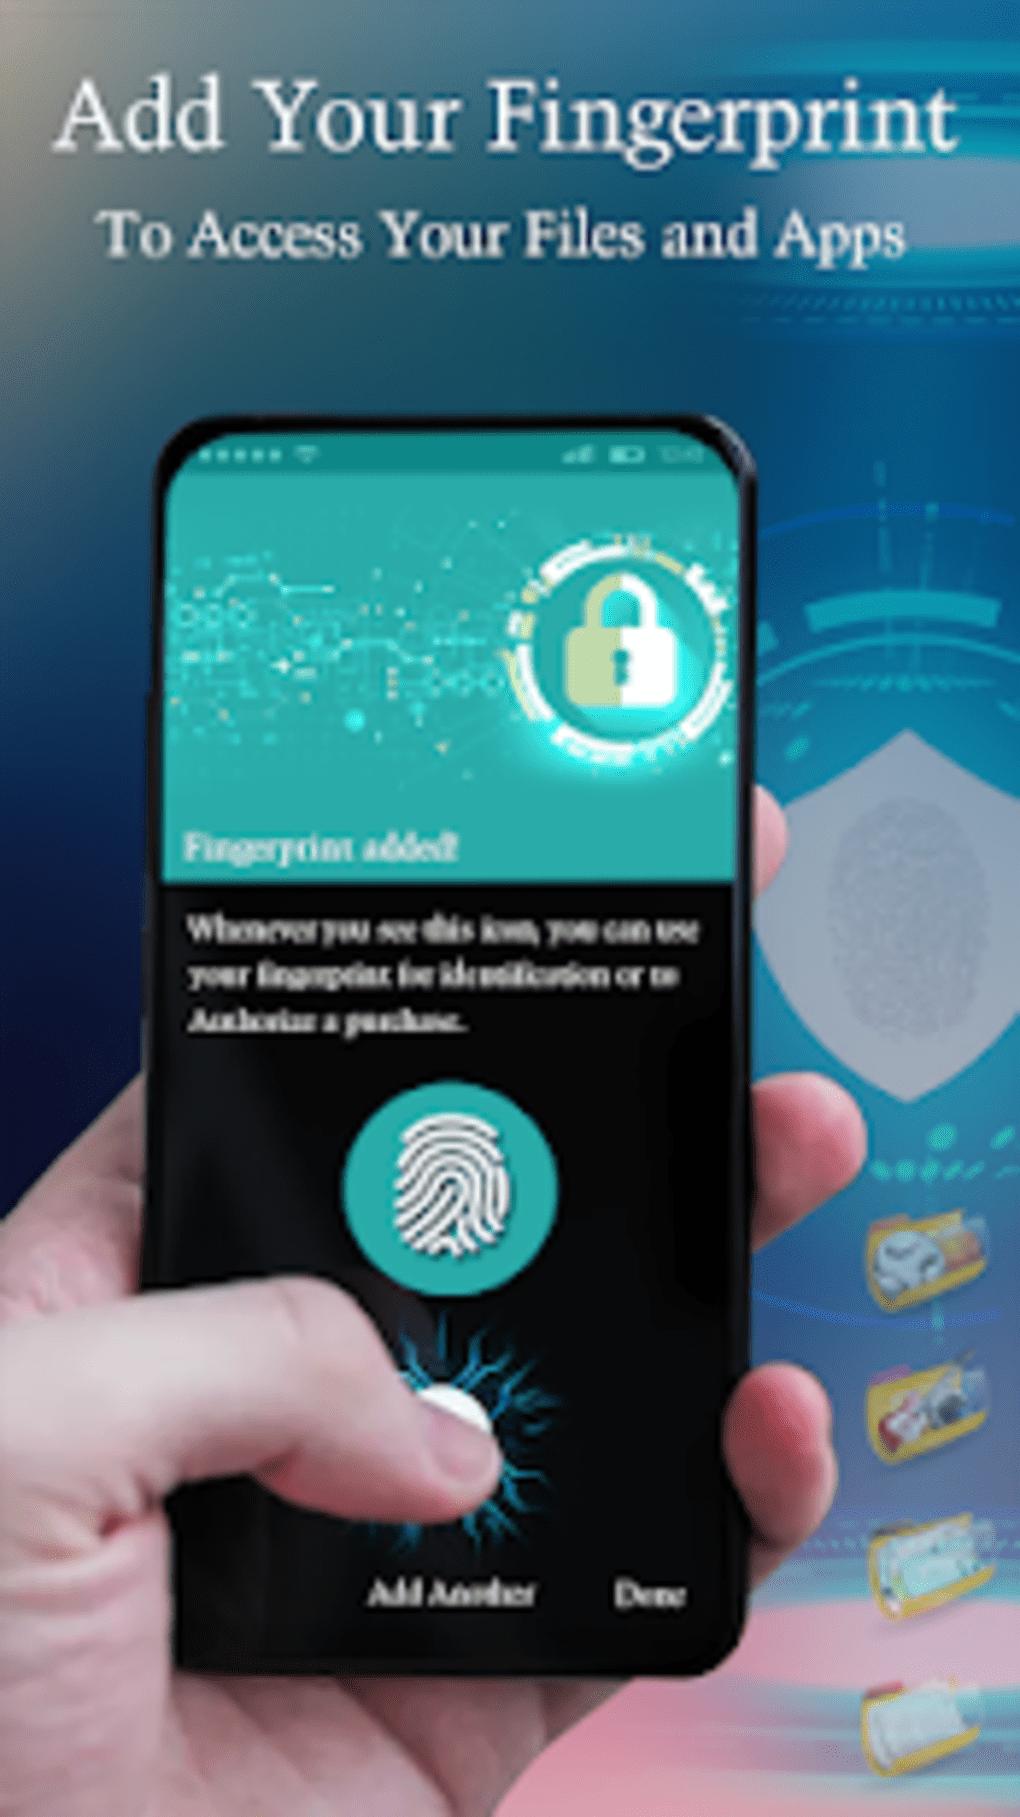 All Applock - Fingerprint Pattern Lock Screen 2019 for